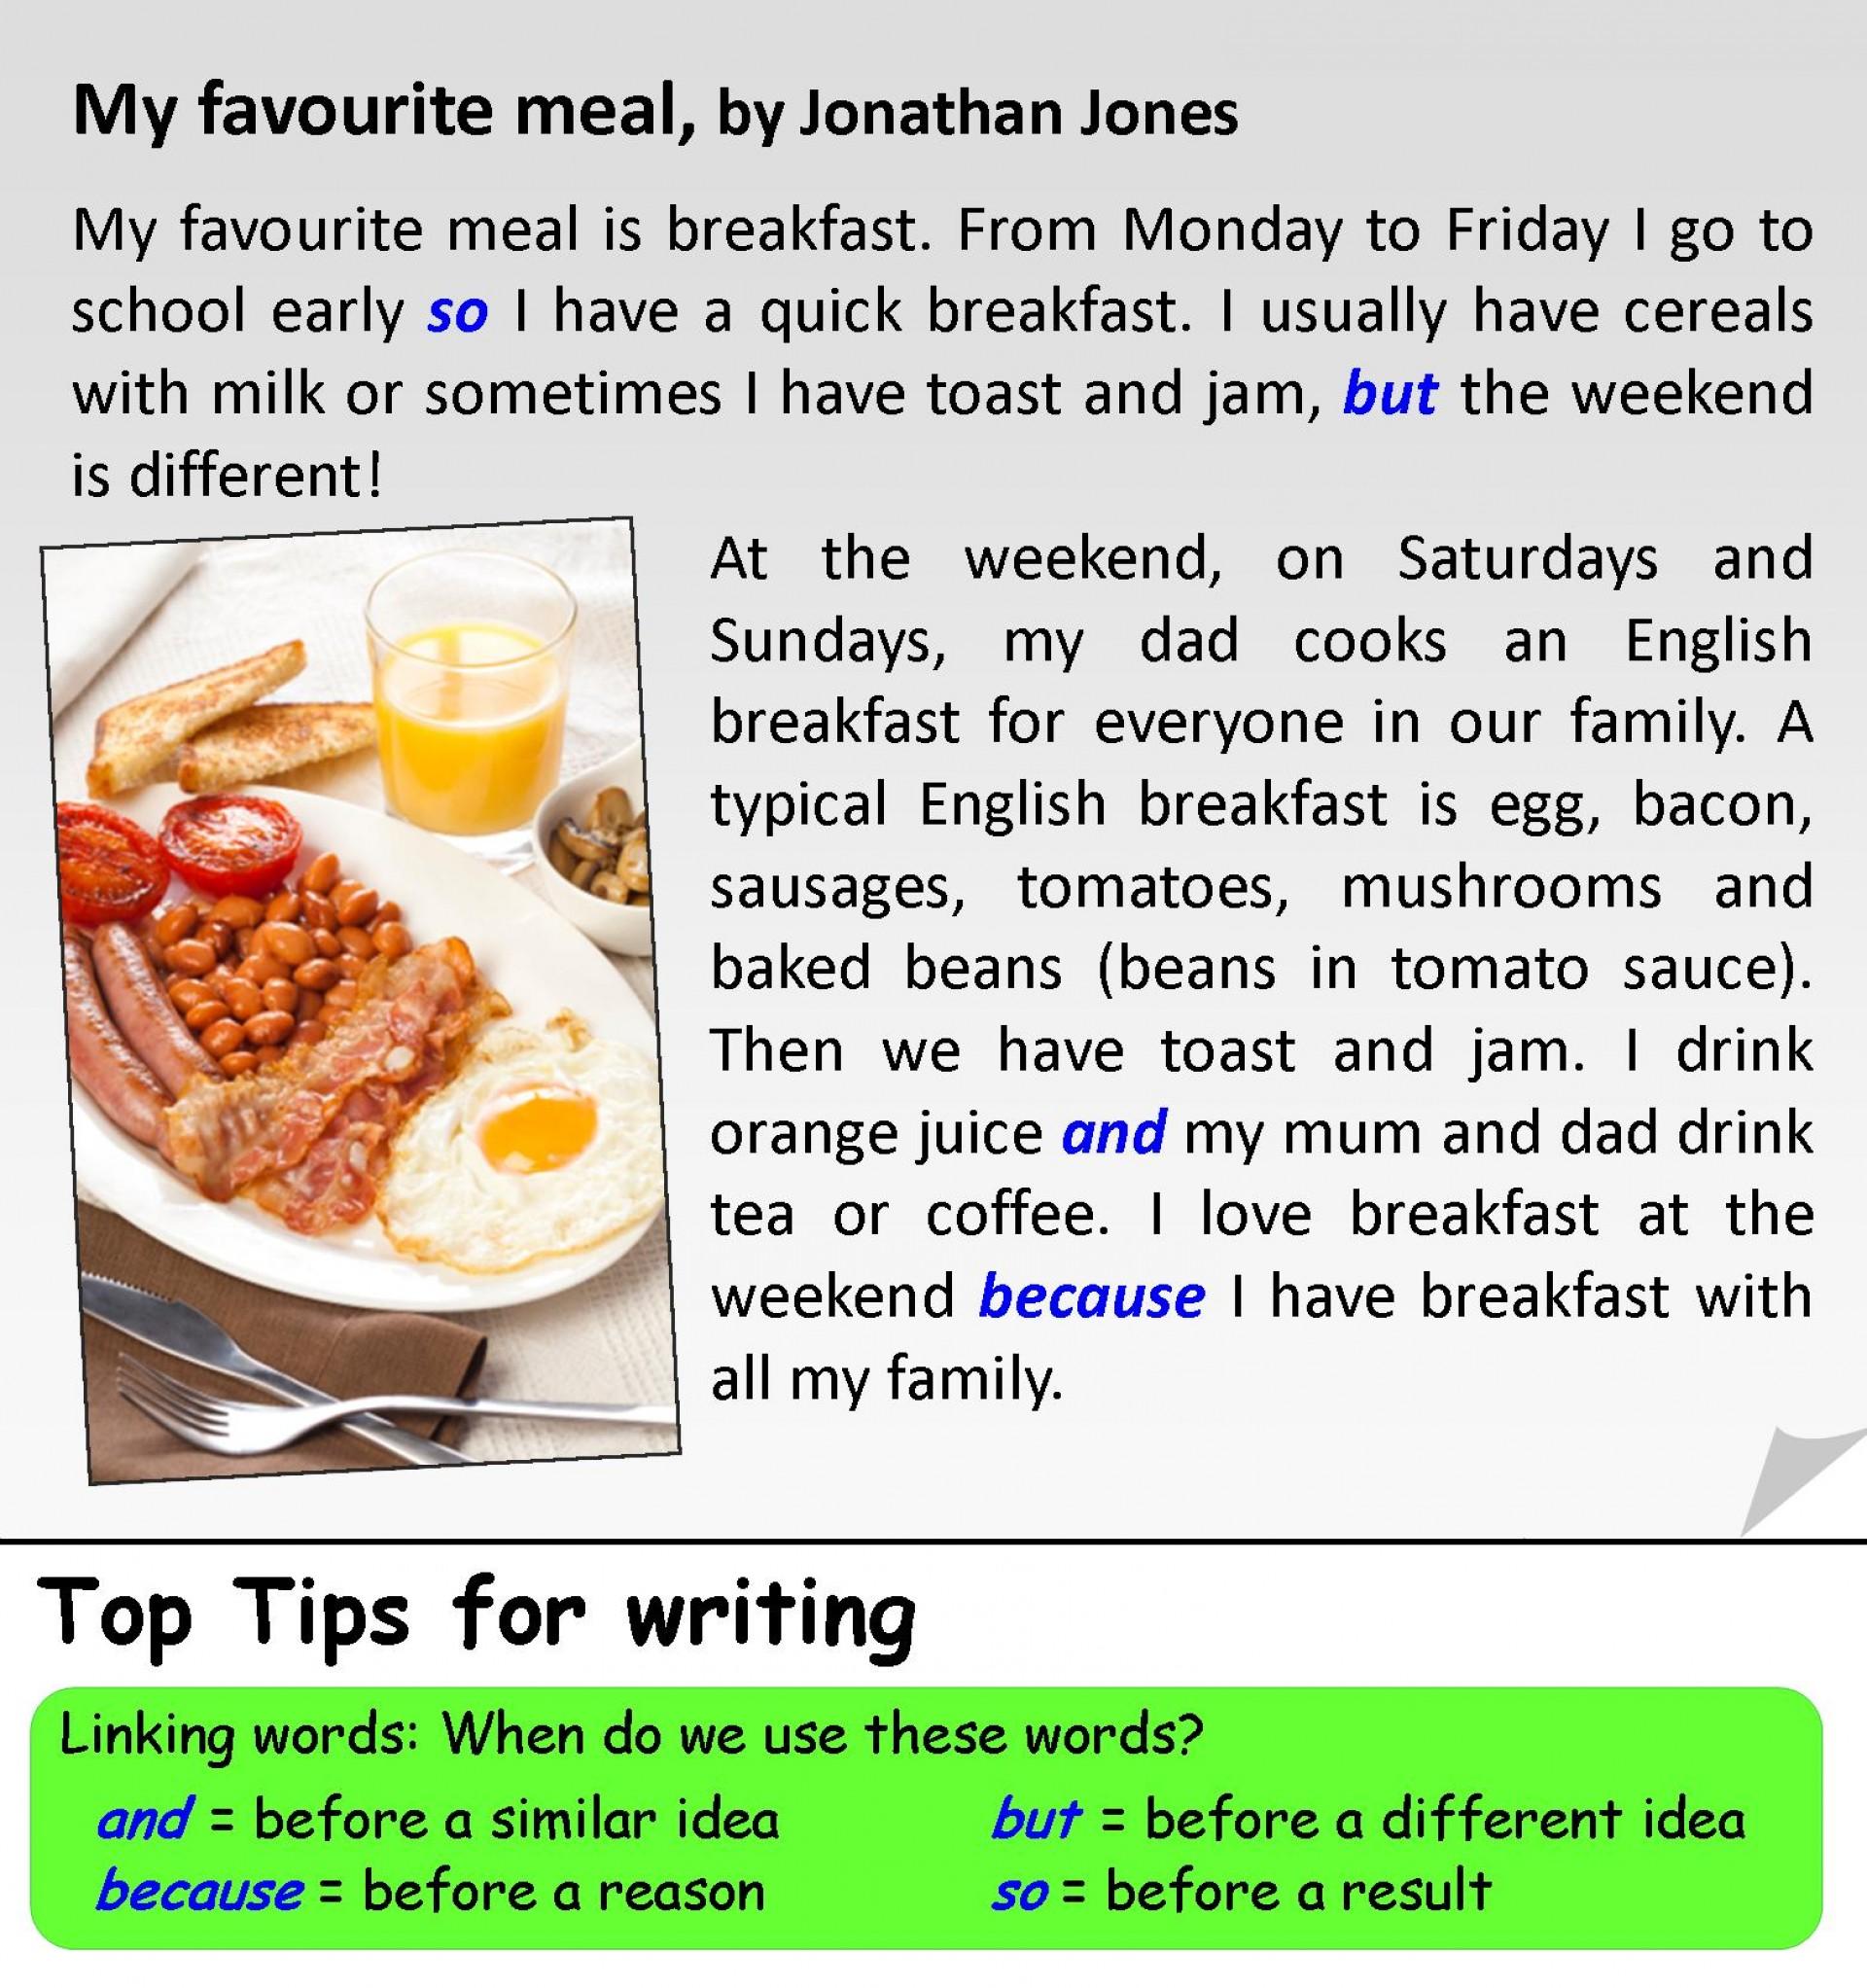 001 My Favorite Food Essay ~ Thatsnotus